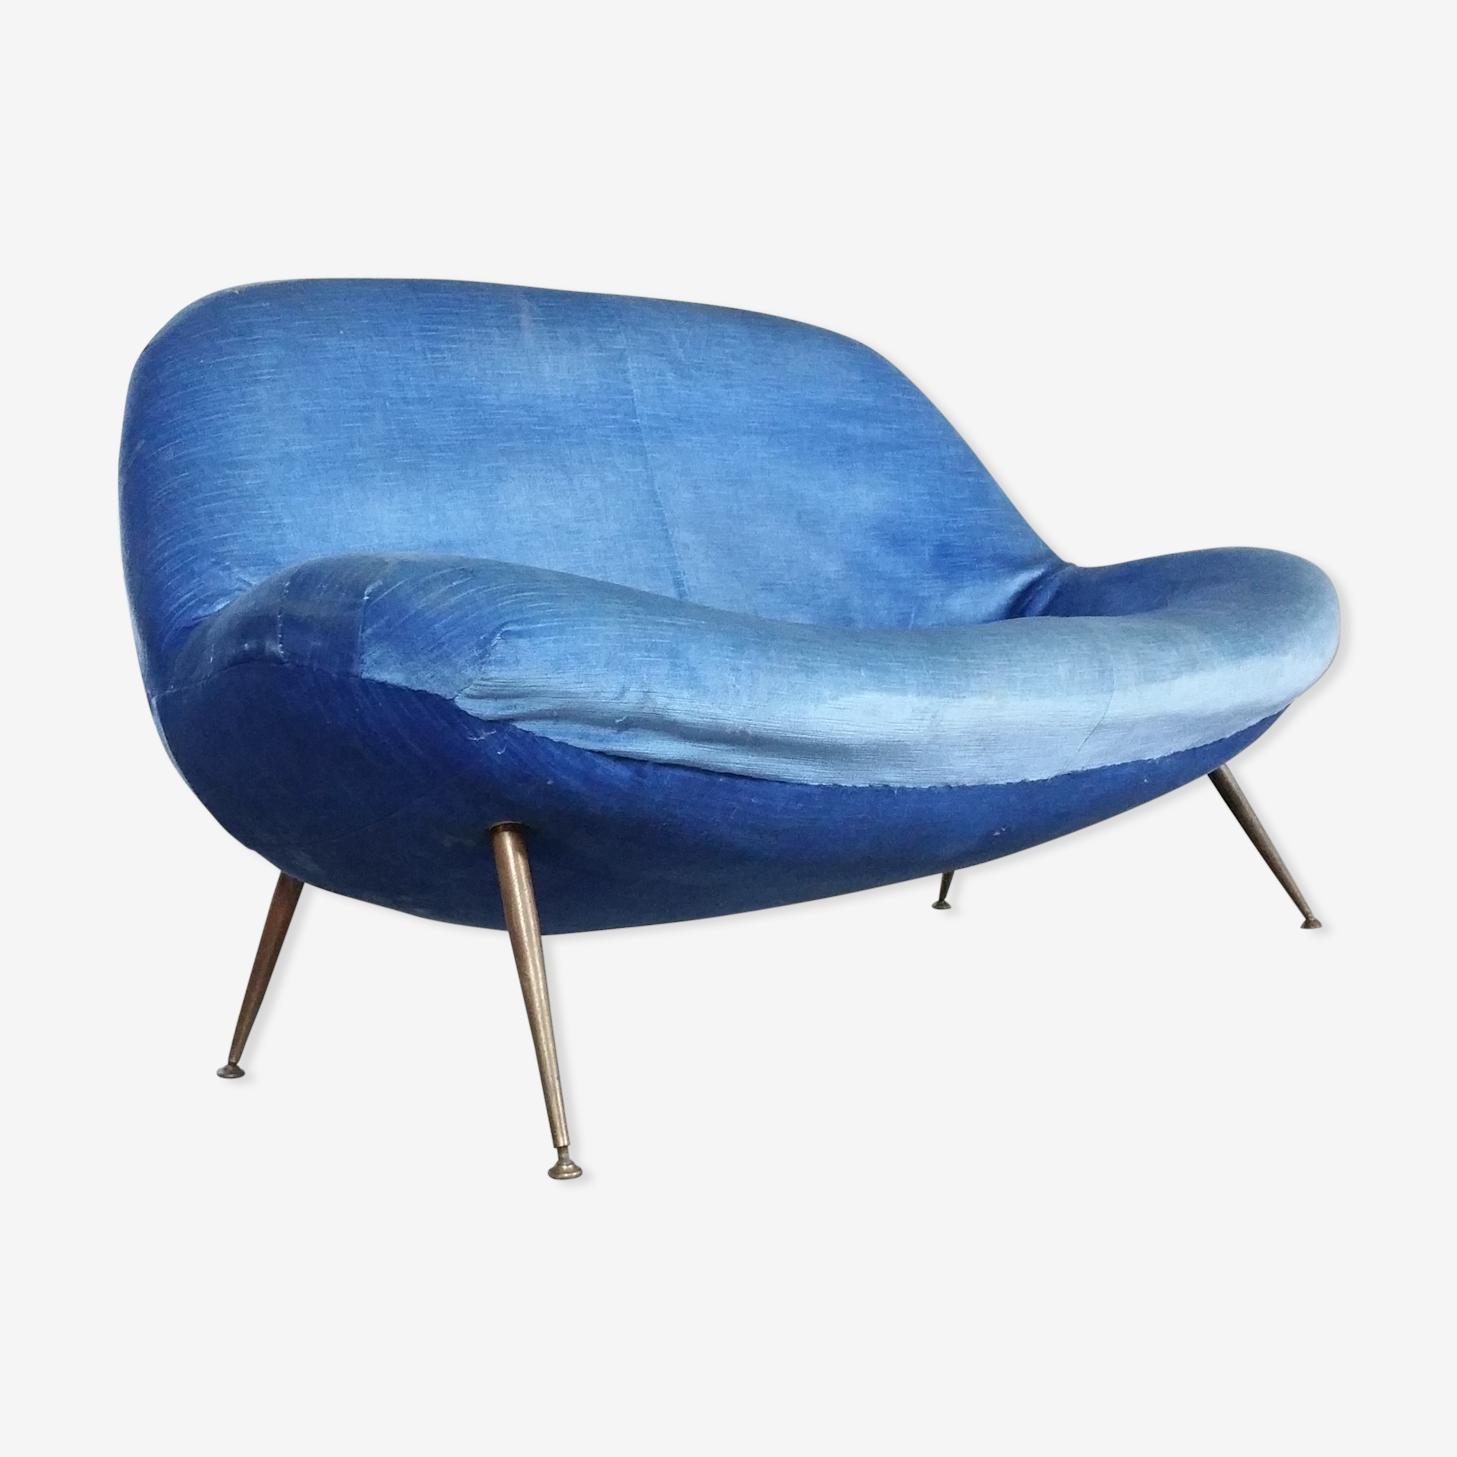 Canapé sofa egg biomorphique de Fritz Neth pour correcta années 1955